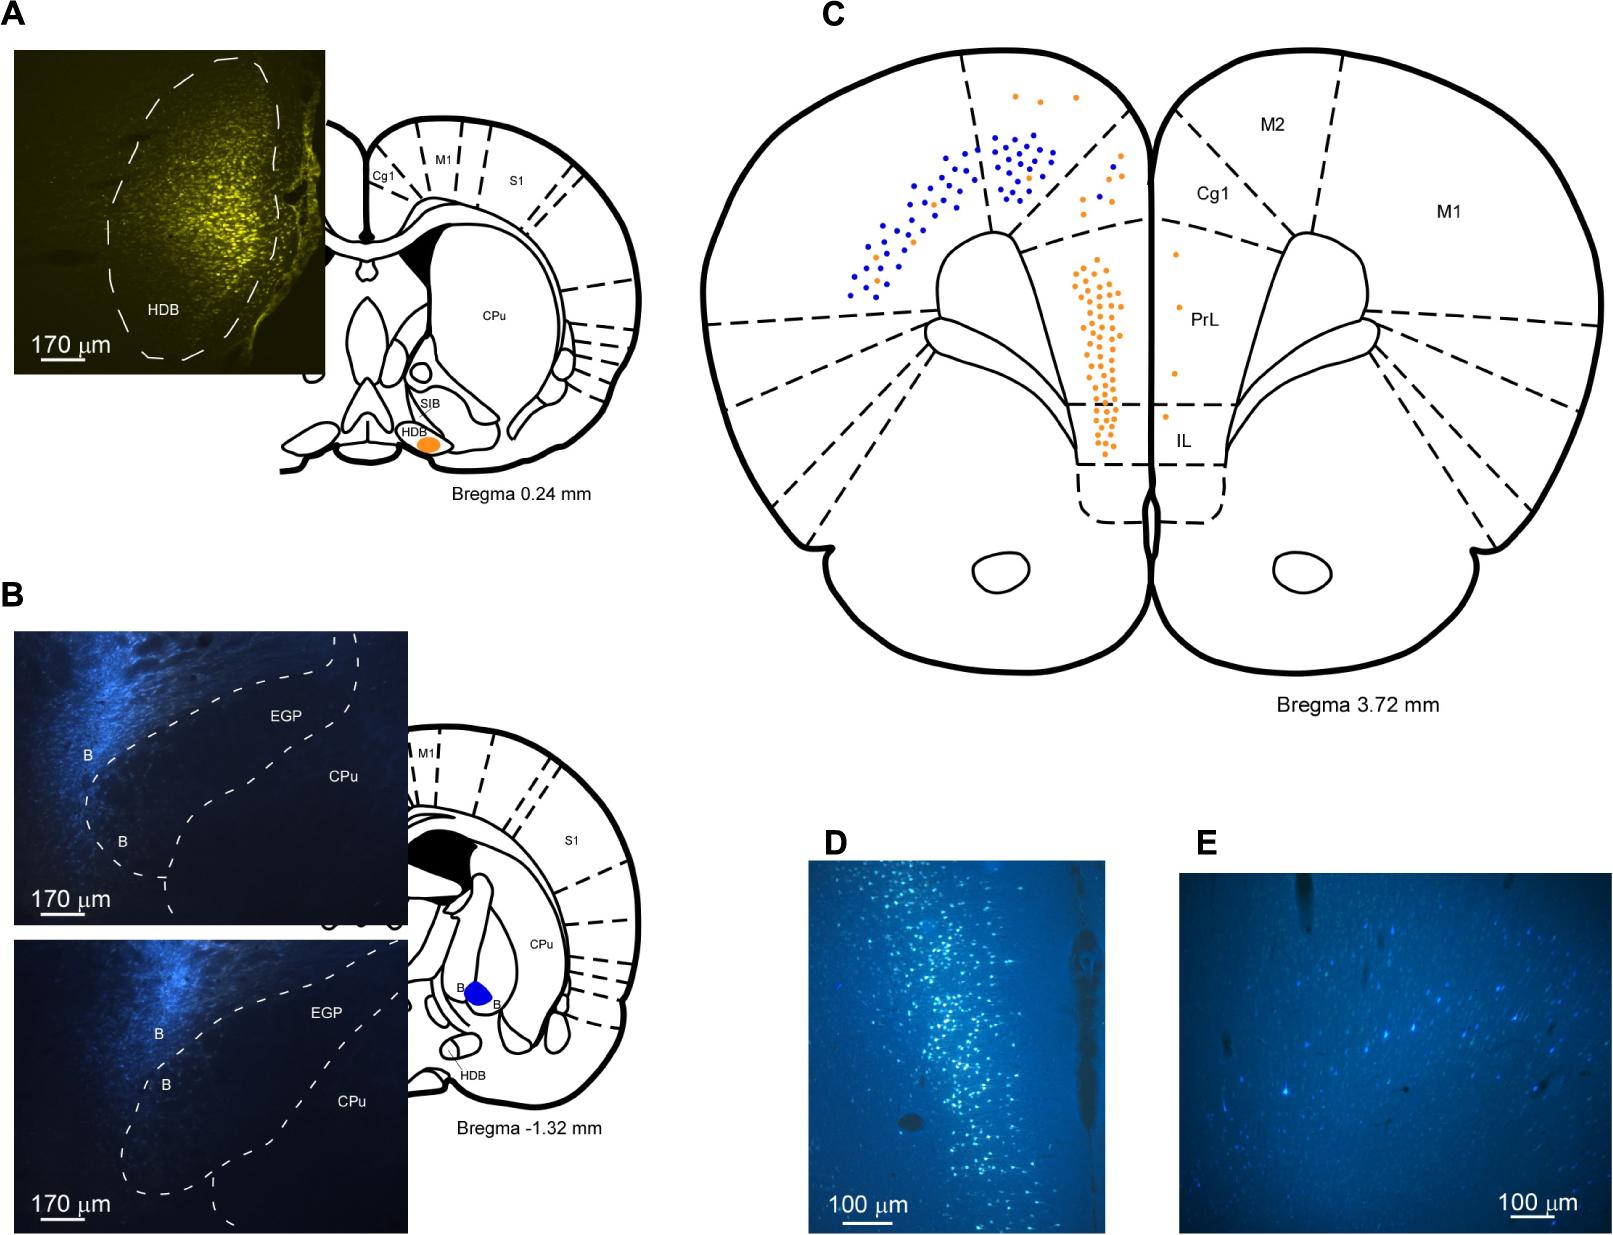 Frontiers Basal Forebrain Nuclei Display Distinct Projecting Pb30 Wiring Diagram